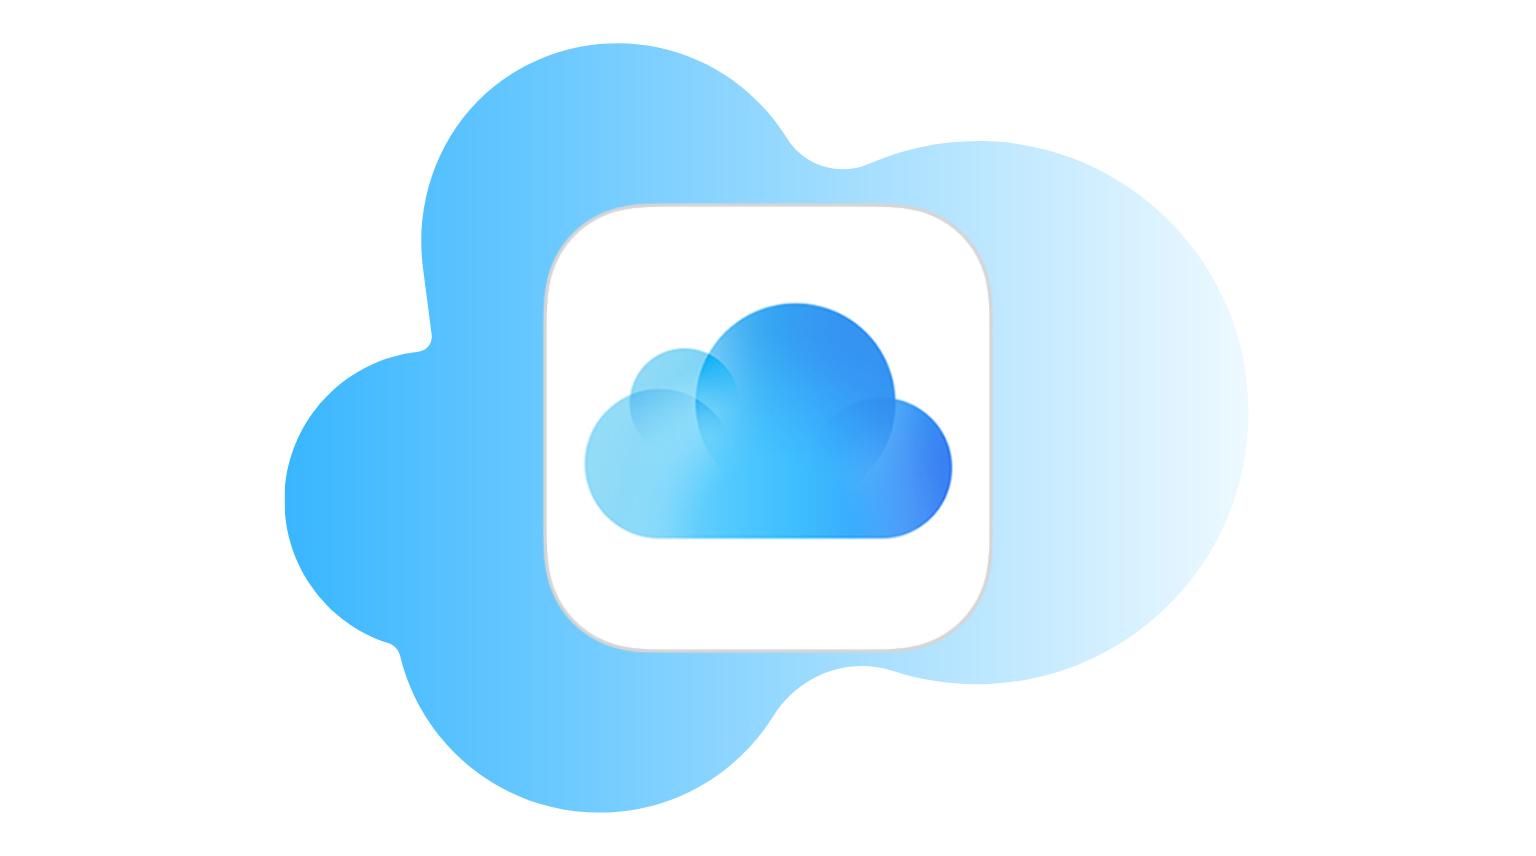 How to get iCloud on iPhone, iPad, Mac, or Windows PC